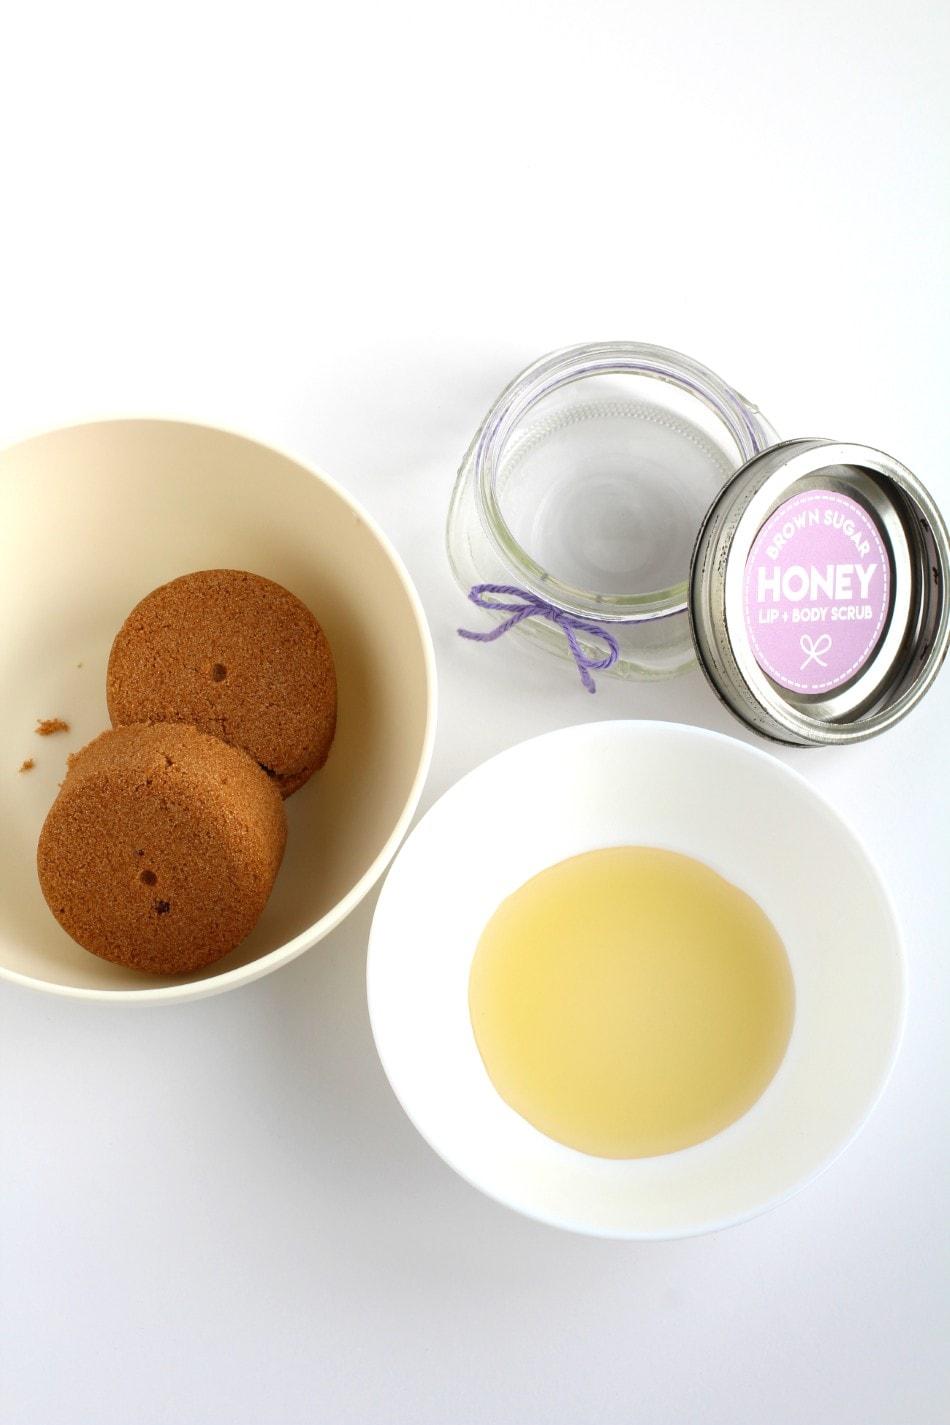 Brown sugar lip scrub materials and ingredients